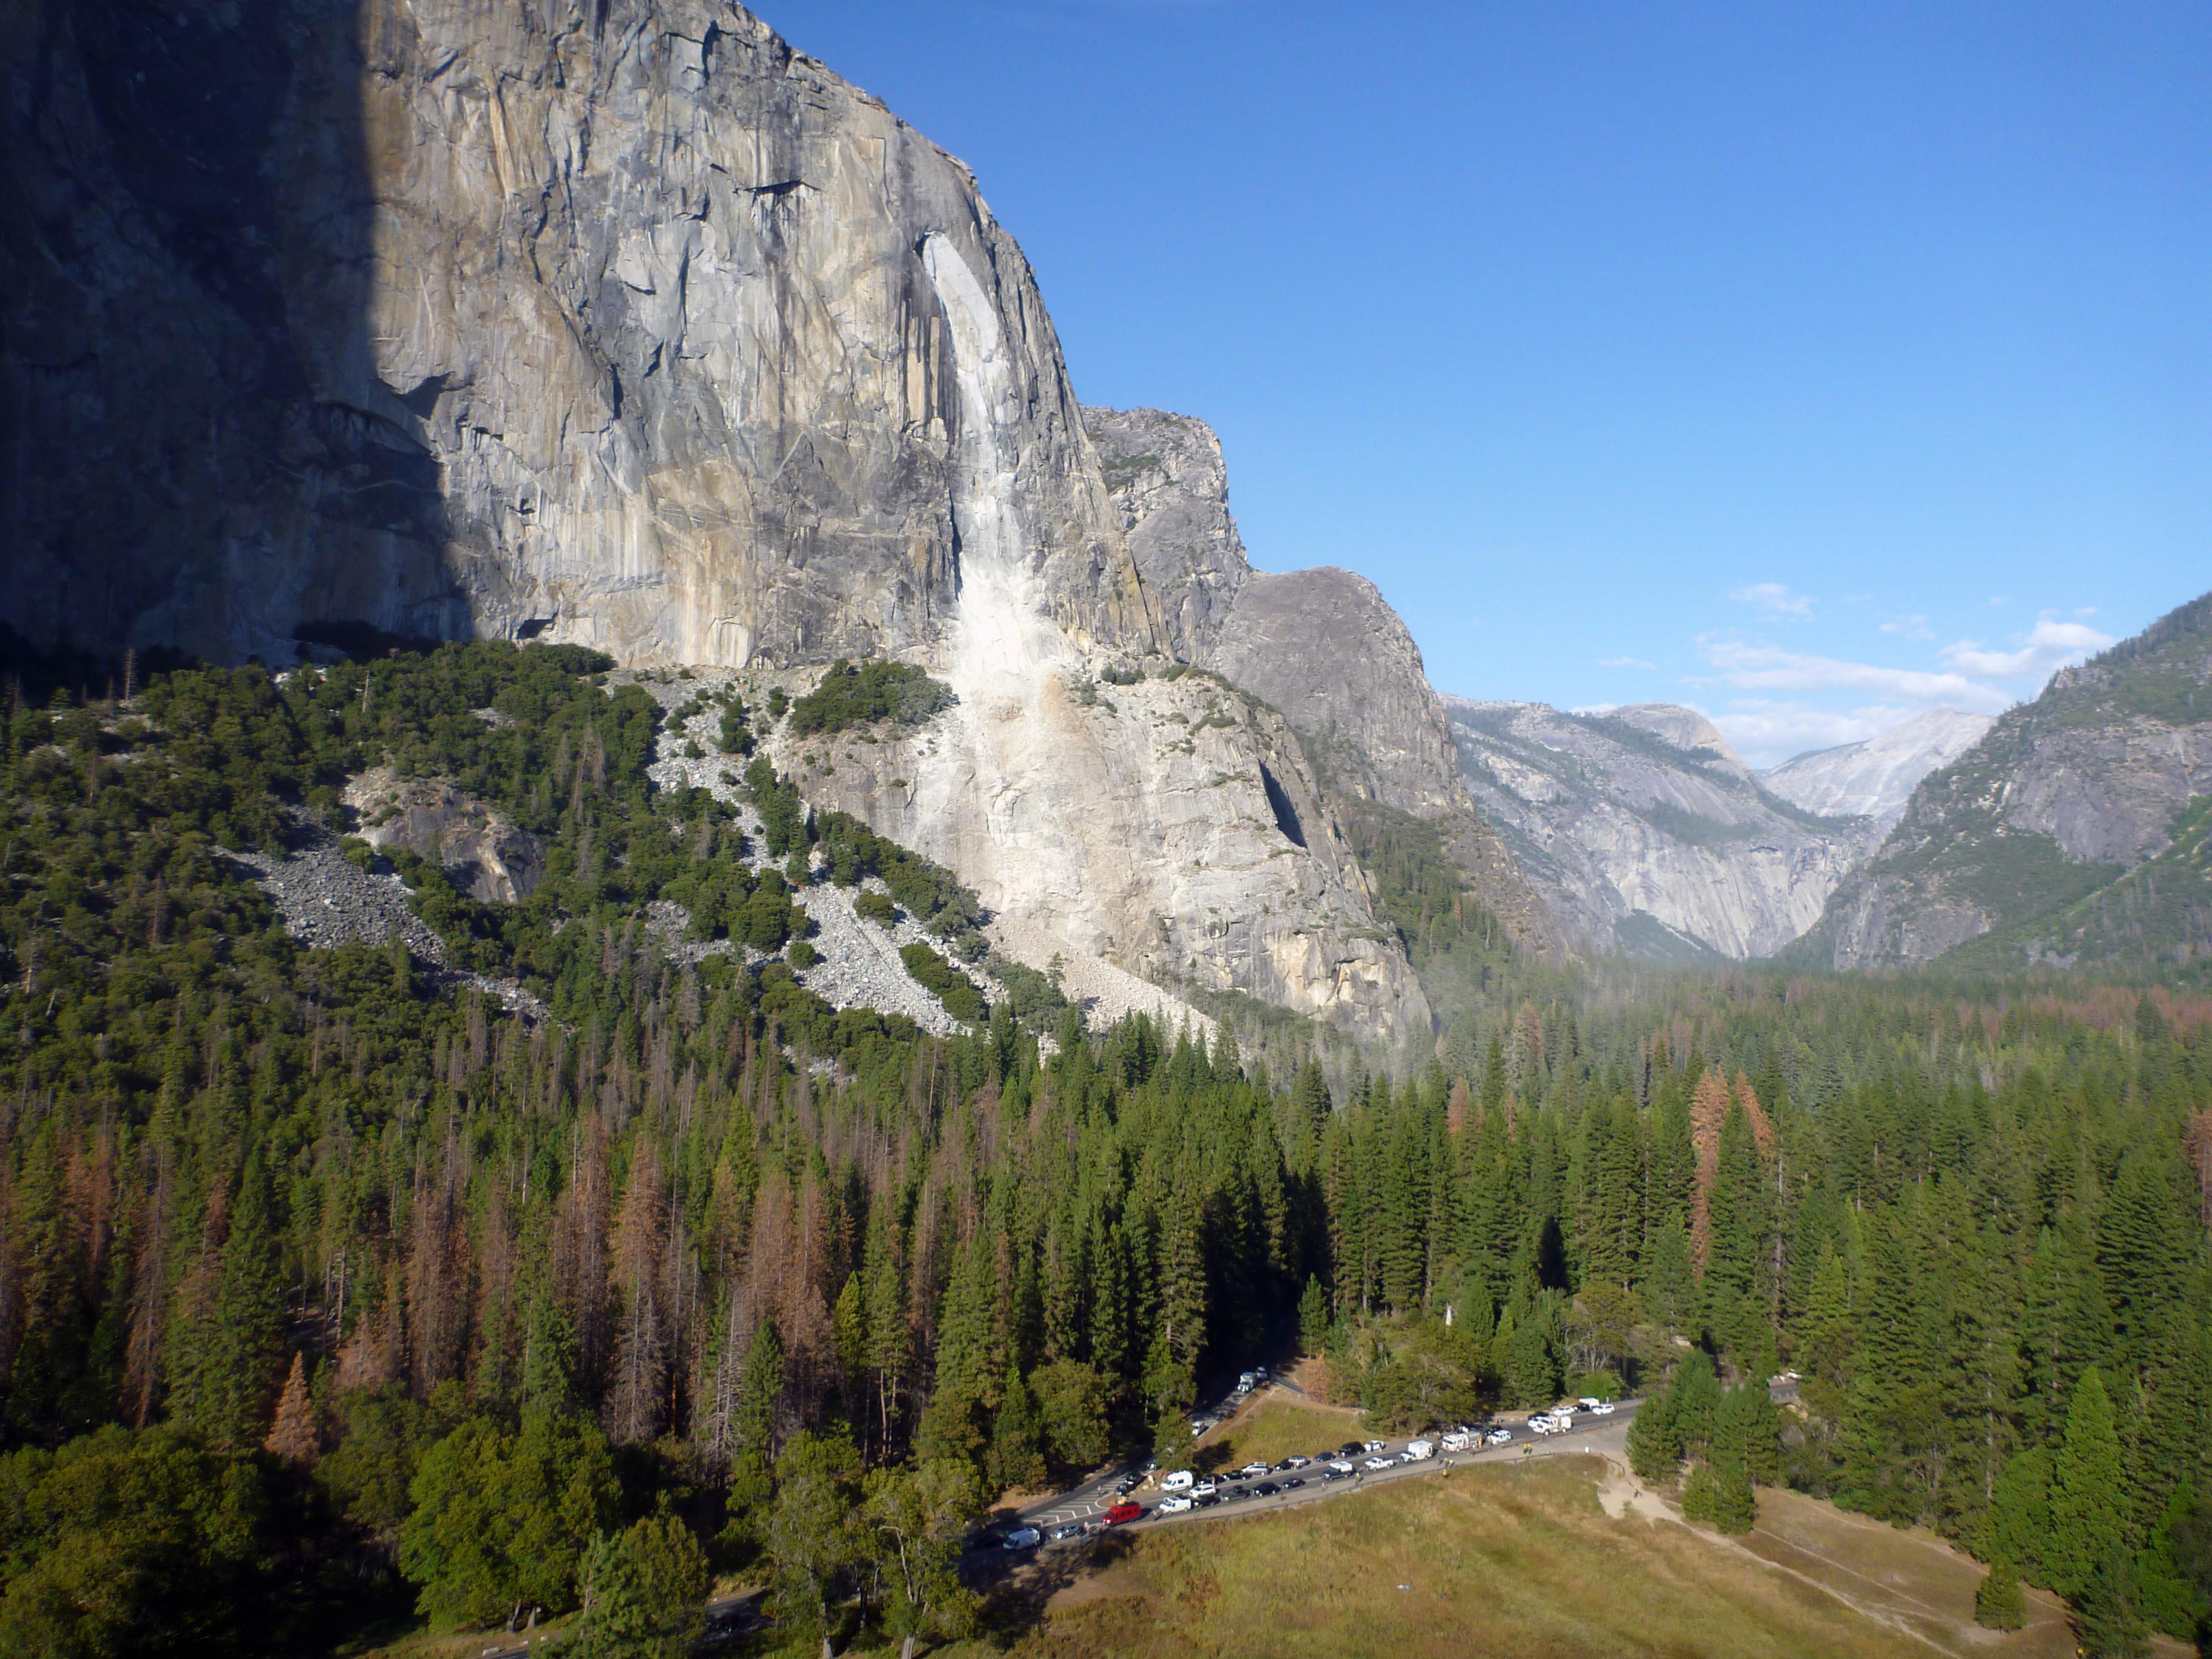 Another Rockfall in Yosemite National Park - Yosemite National ...